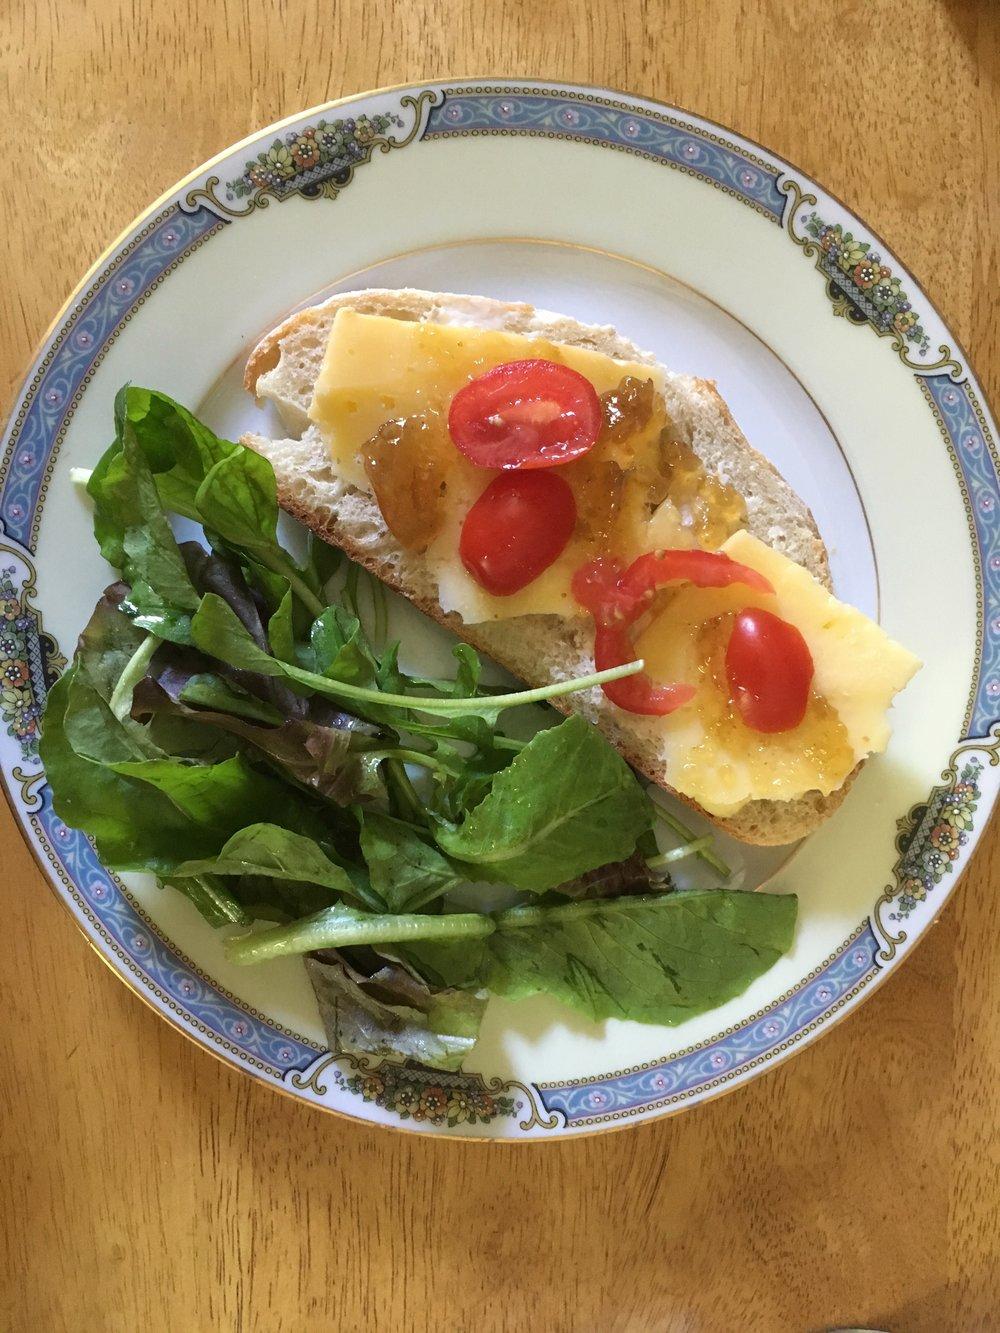 Saugerties farmer's market sandwich